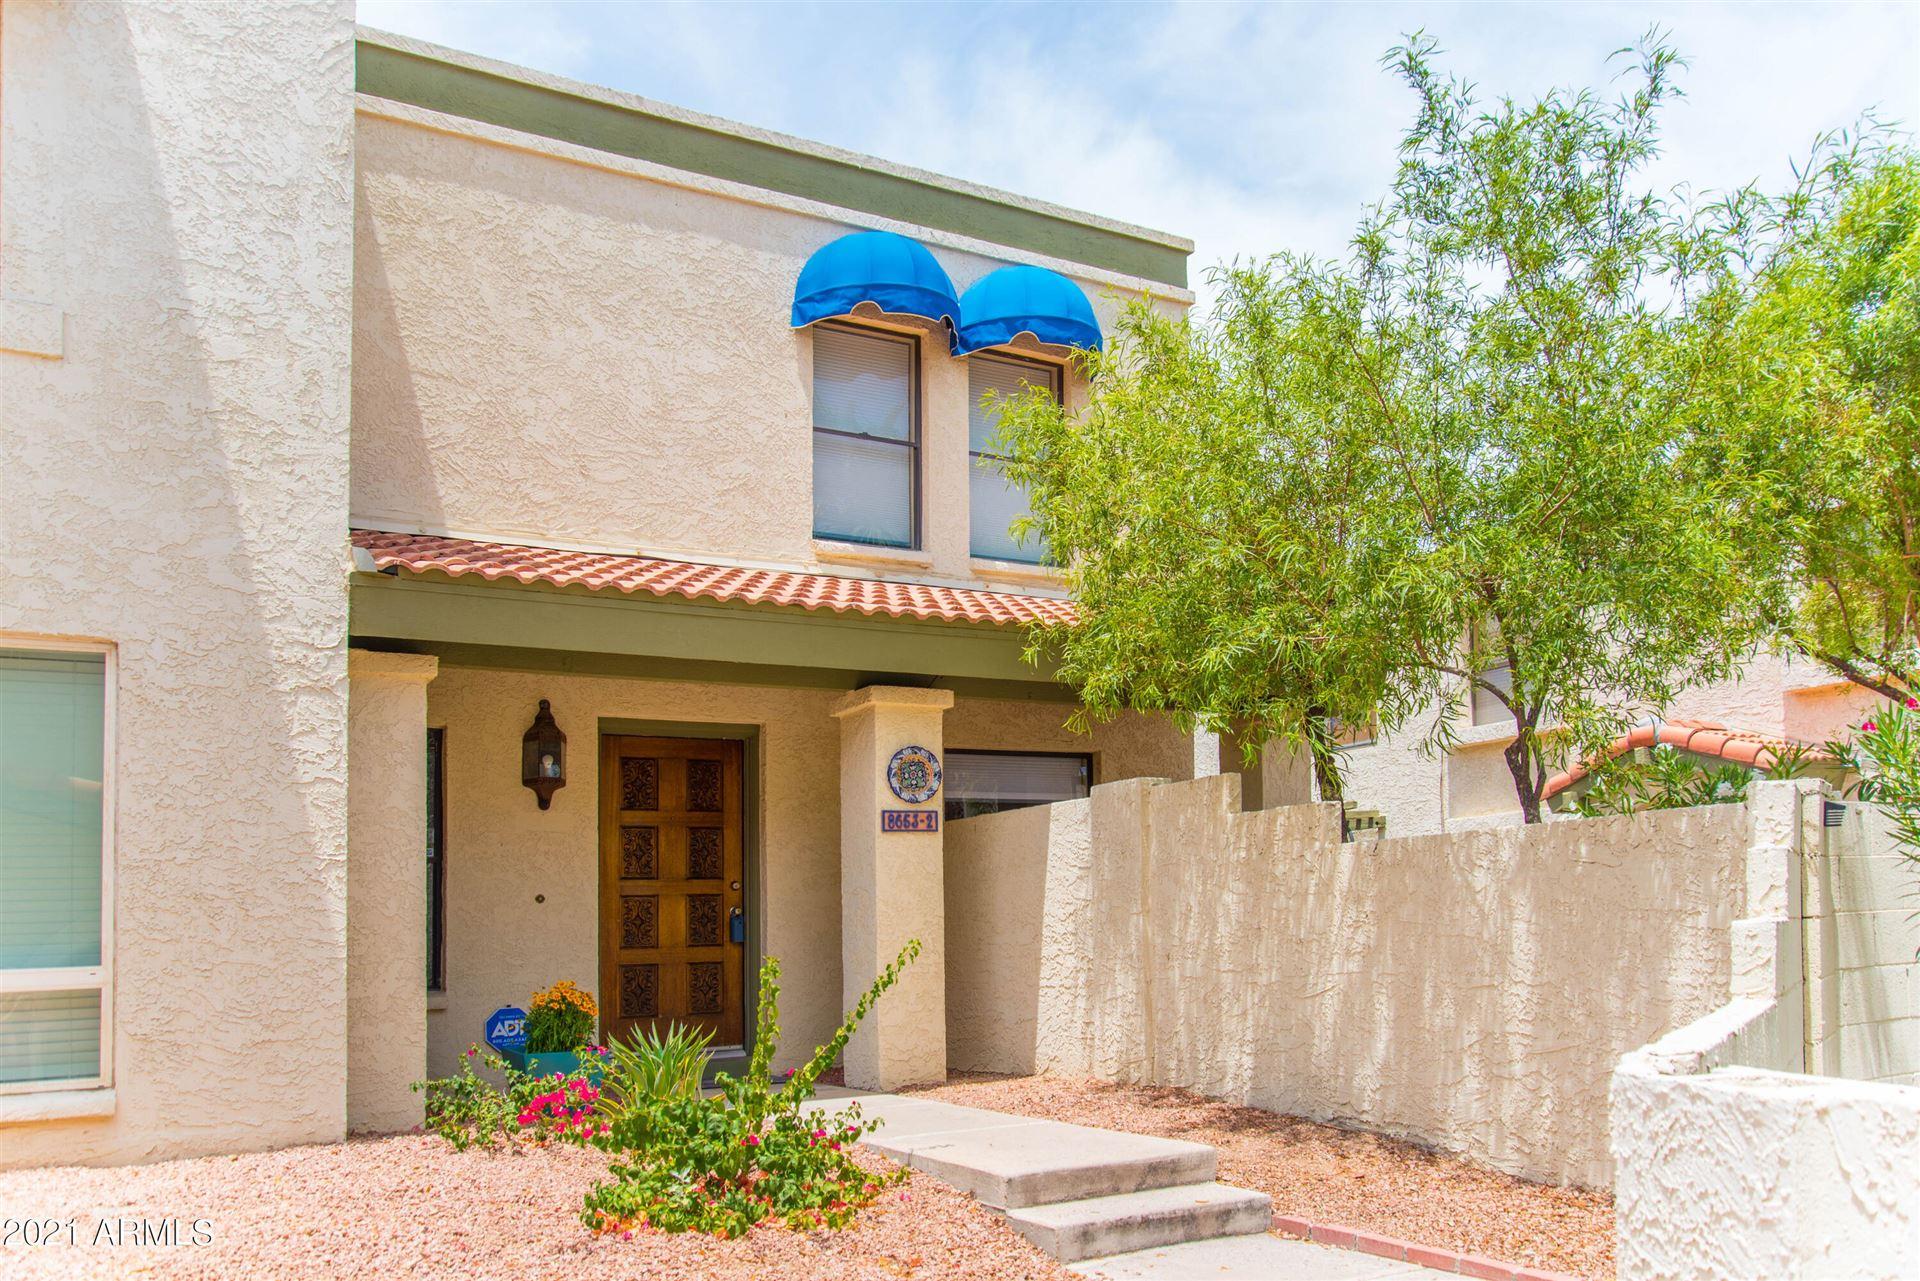 8653 S 51ST Street #2, Phoenix, AZ 85044 - MLS#: 6247830